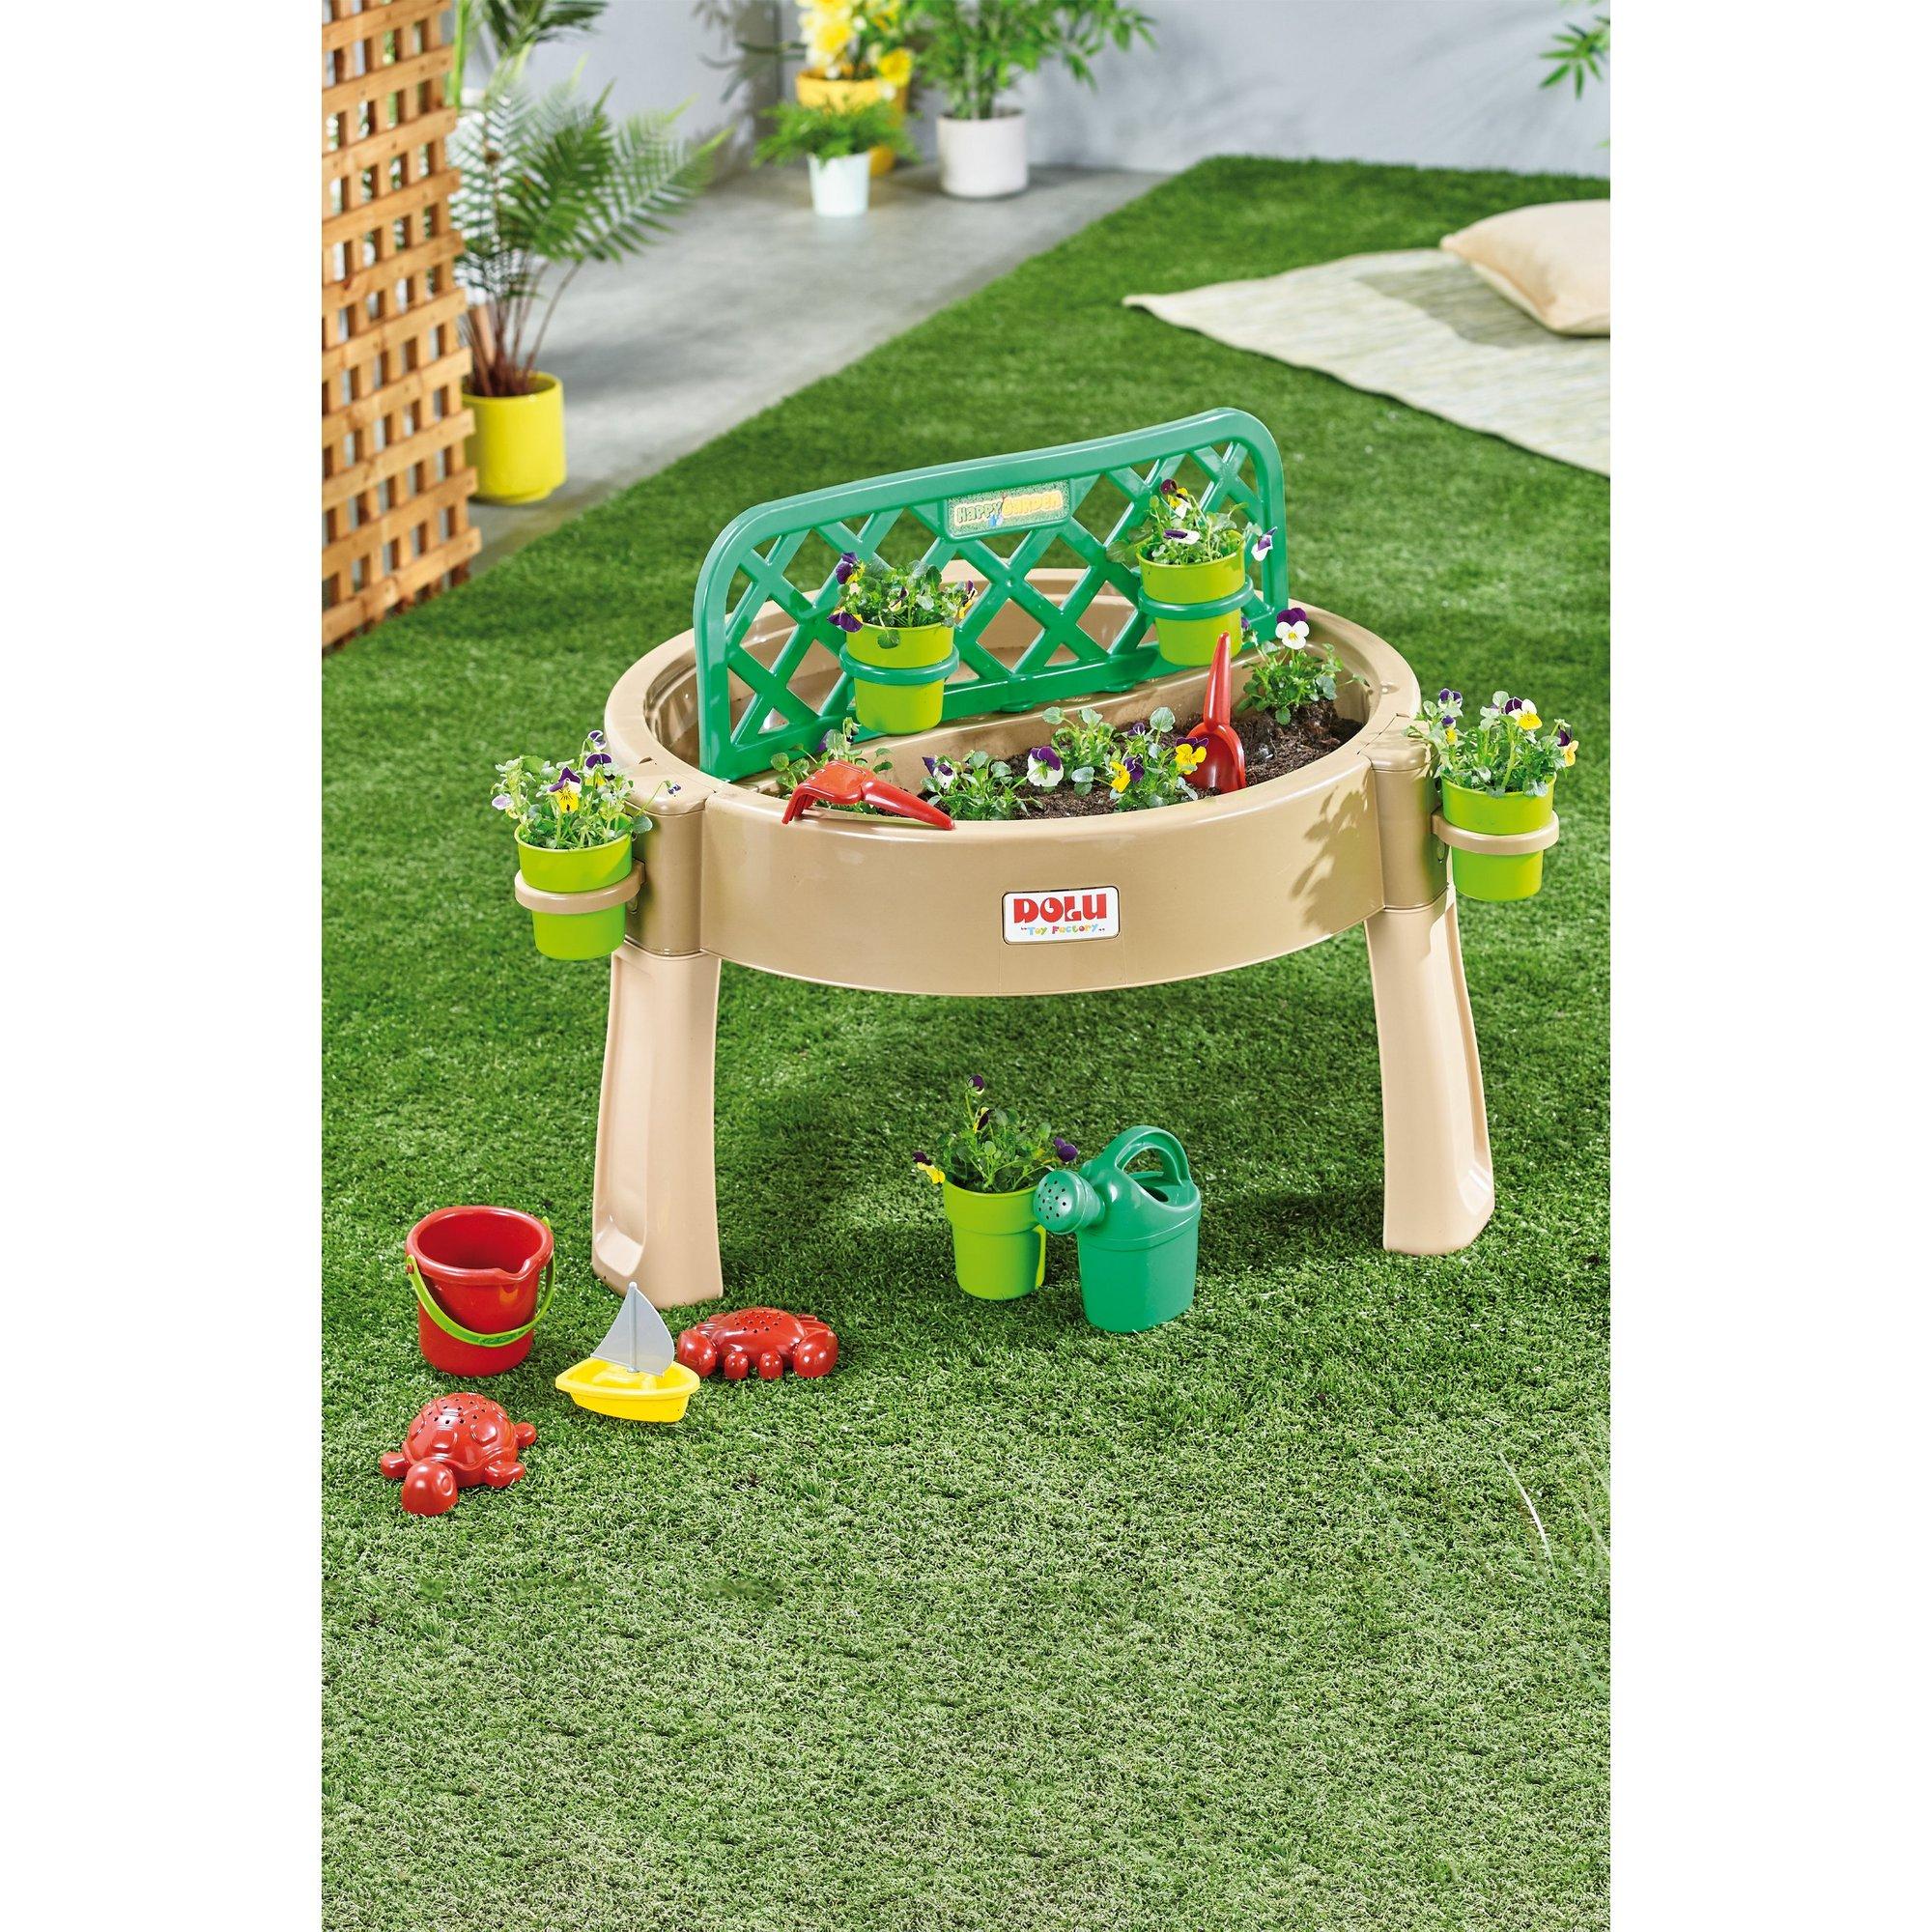 Image of Dolu 4-In-1 Gardening Table